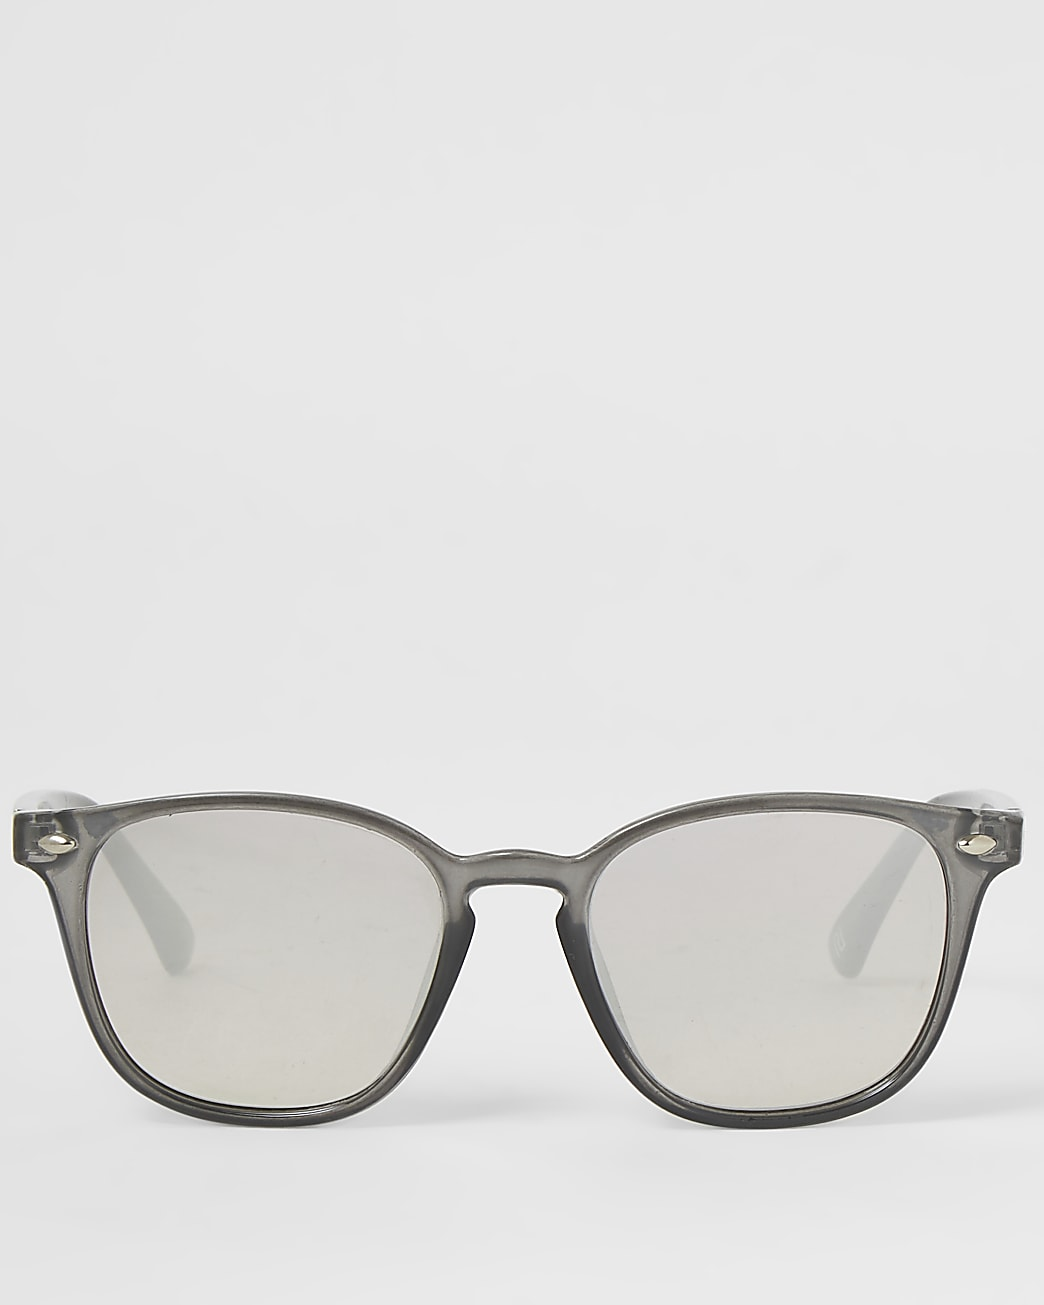 Grey retro shape slim sunglasses